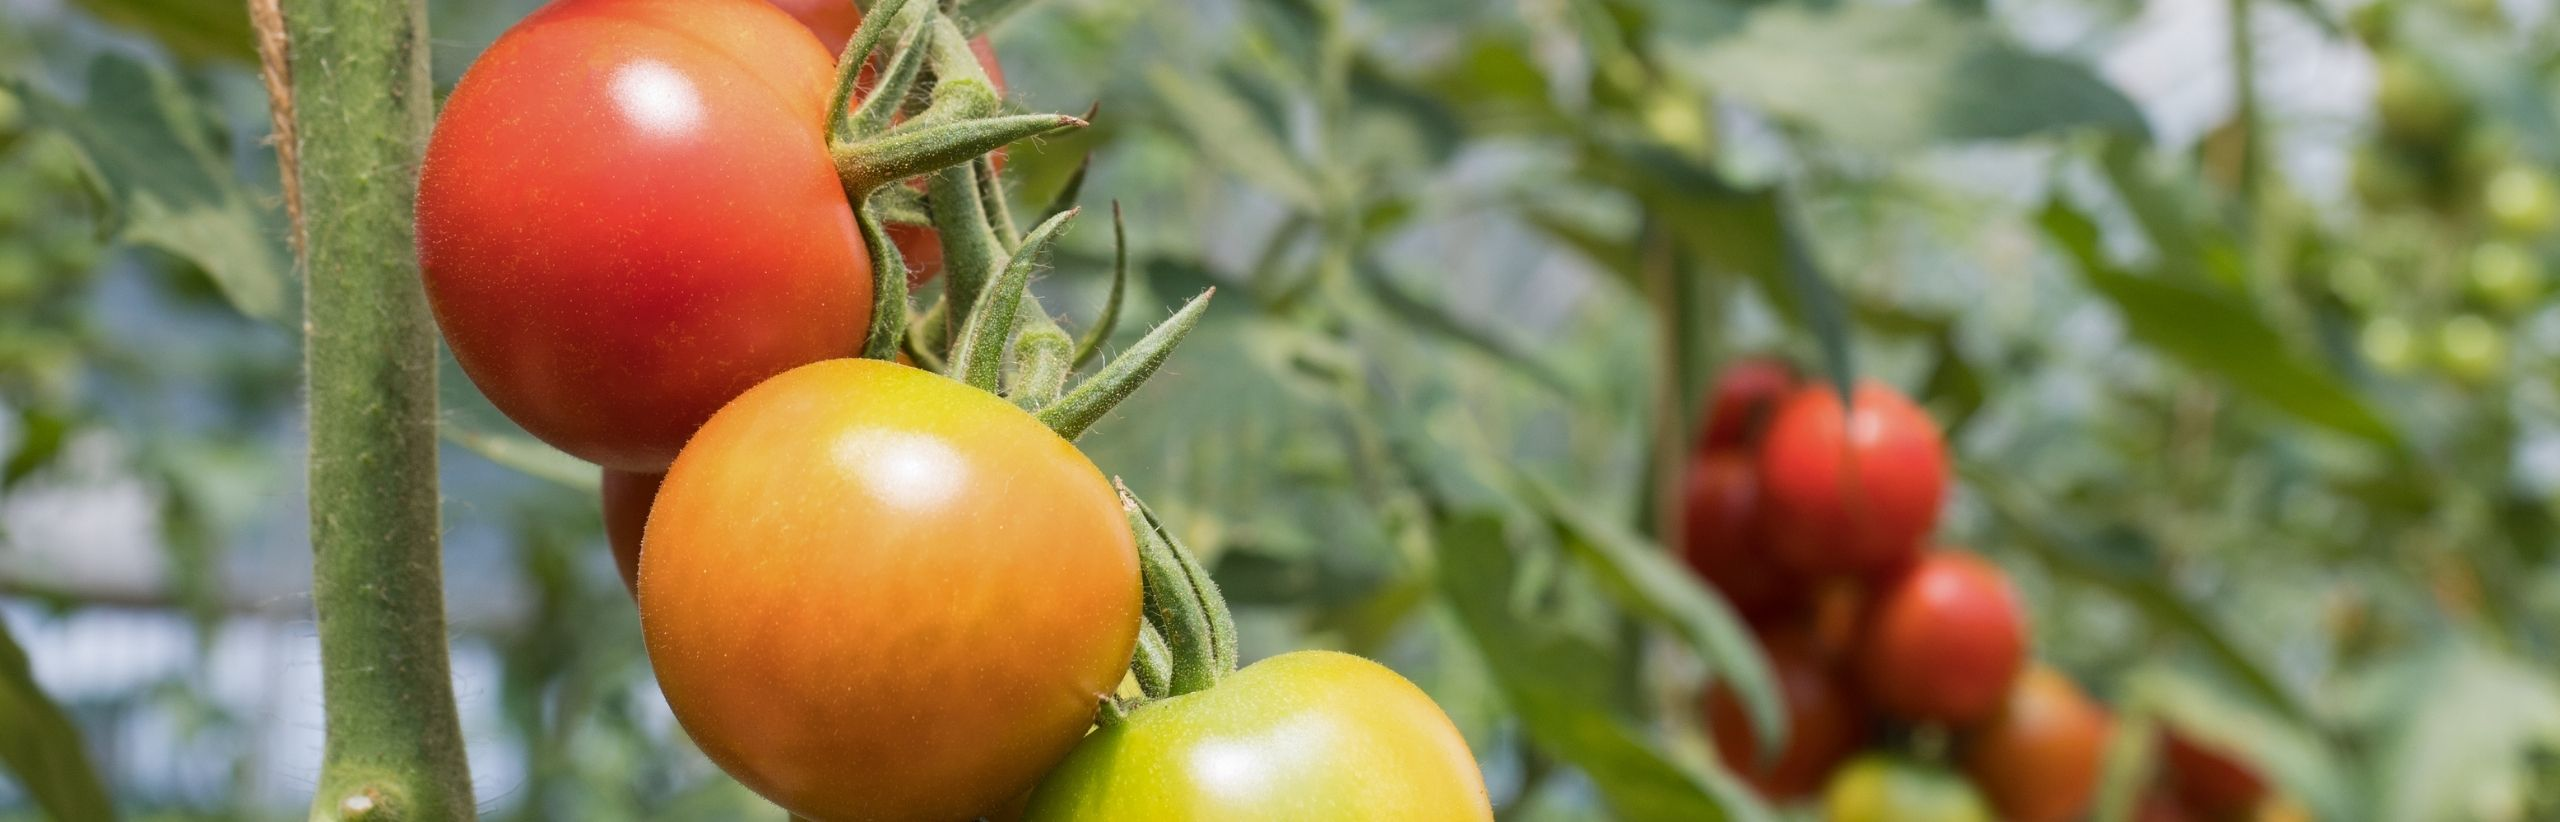 irrigazione a goccia pomodori